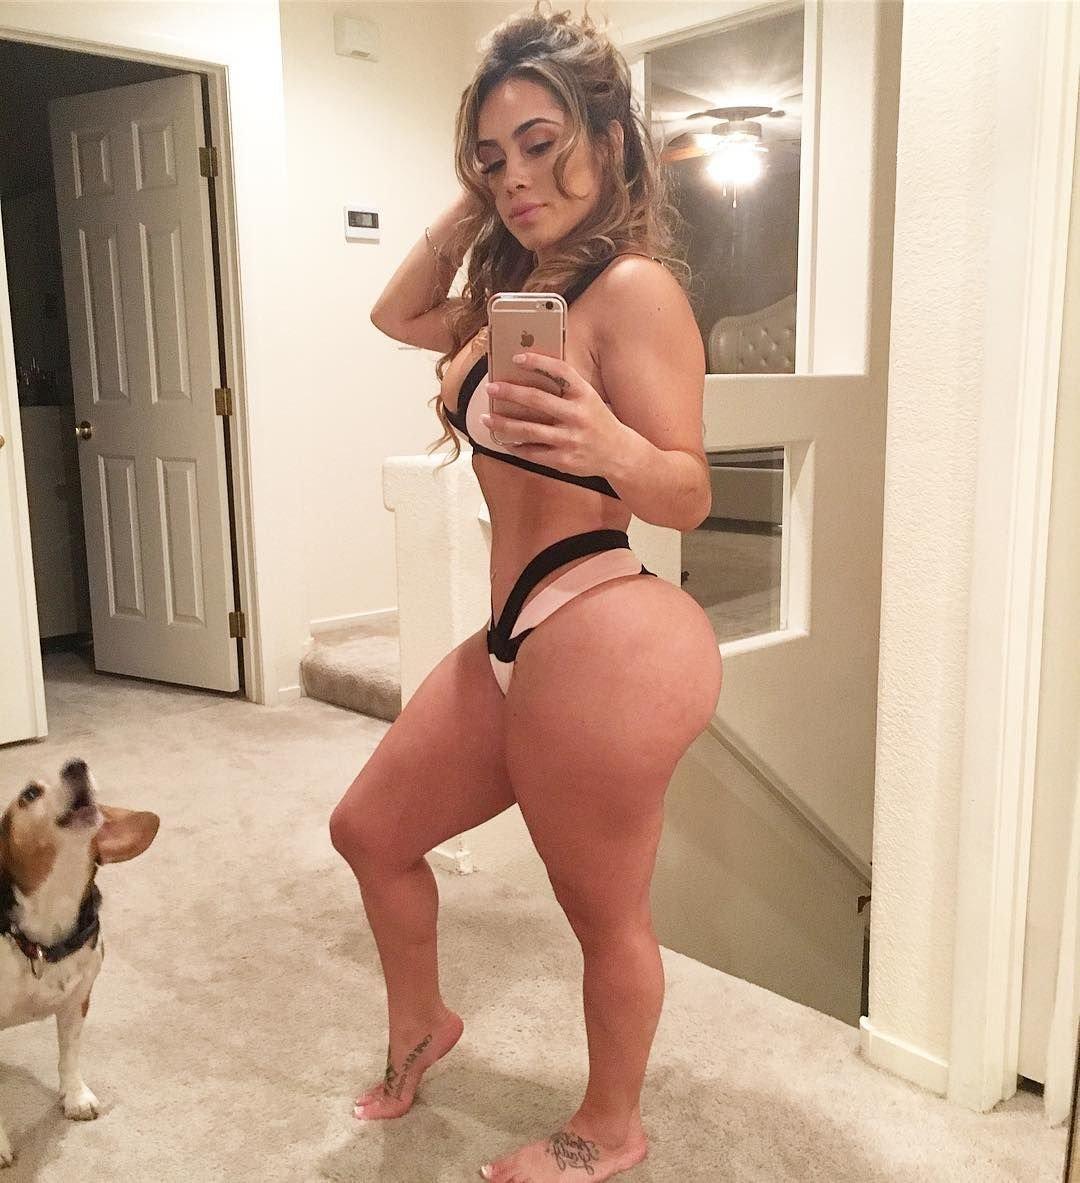 jasmin sex free dating